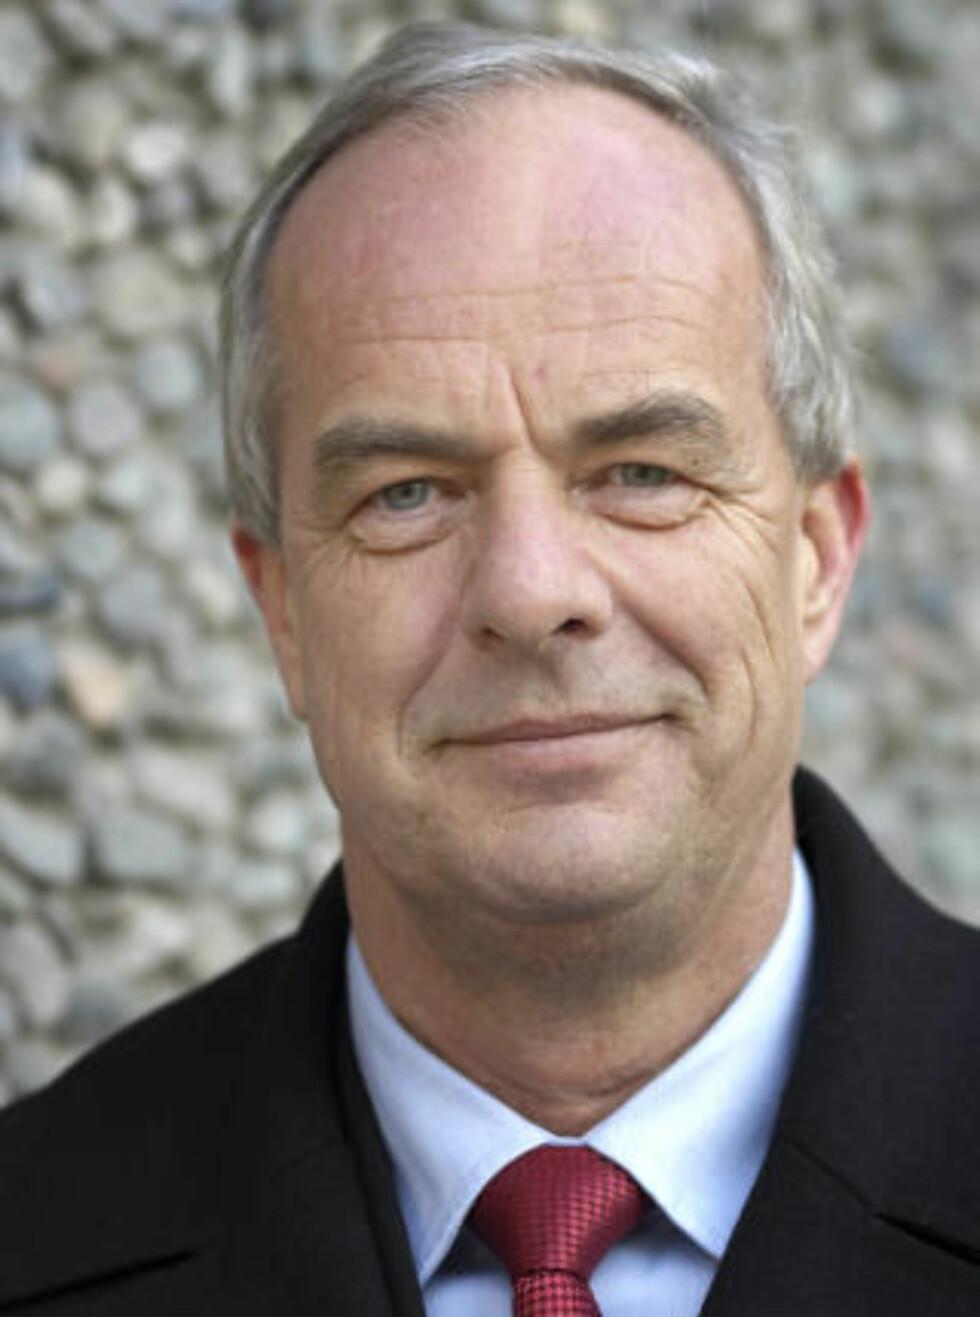 KOMPROMISS: Statssekretær Terje Moland Pedersen i Justisdepartementet sier regjeringens lovforslag er et rimelig kompromiss mellom hensynet til festerne og bortfesterne.Pressefoto: Justisdepartementet